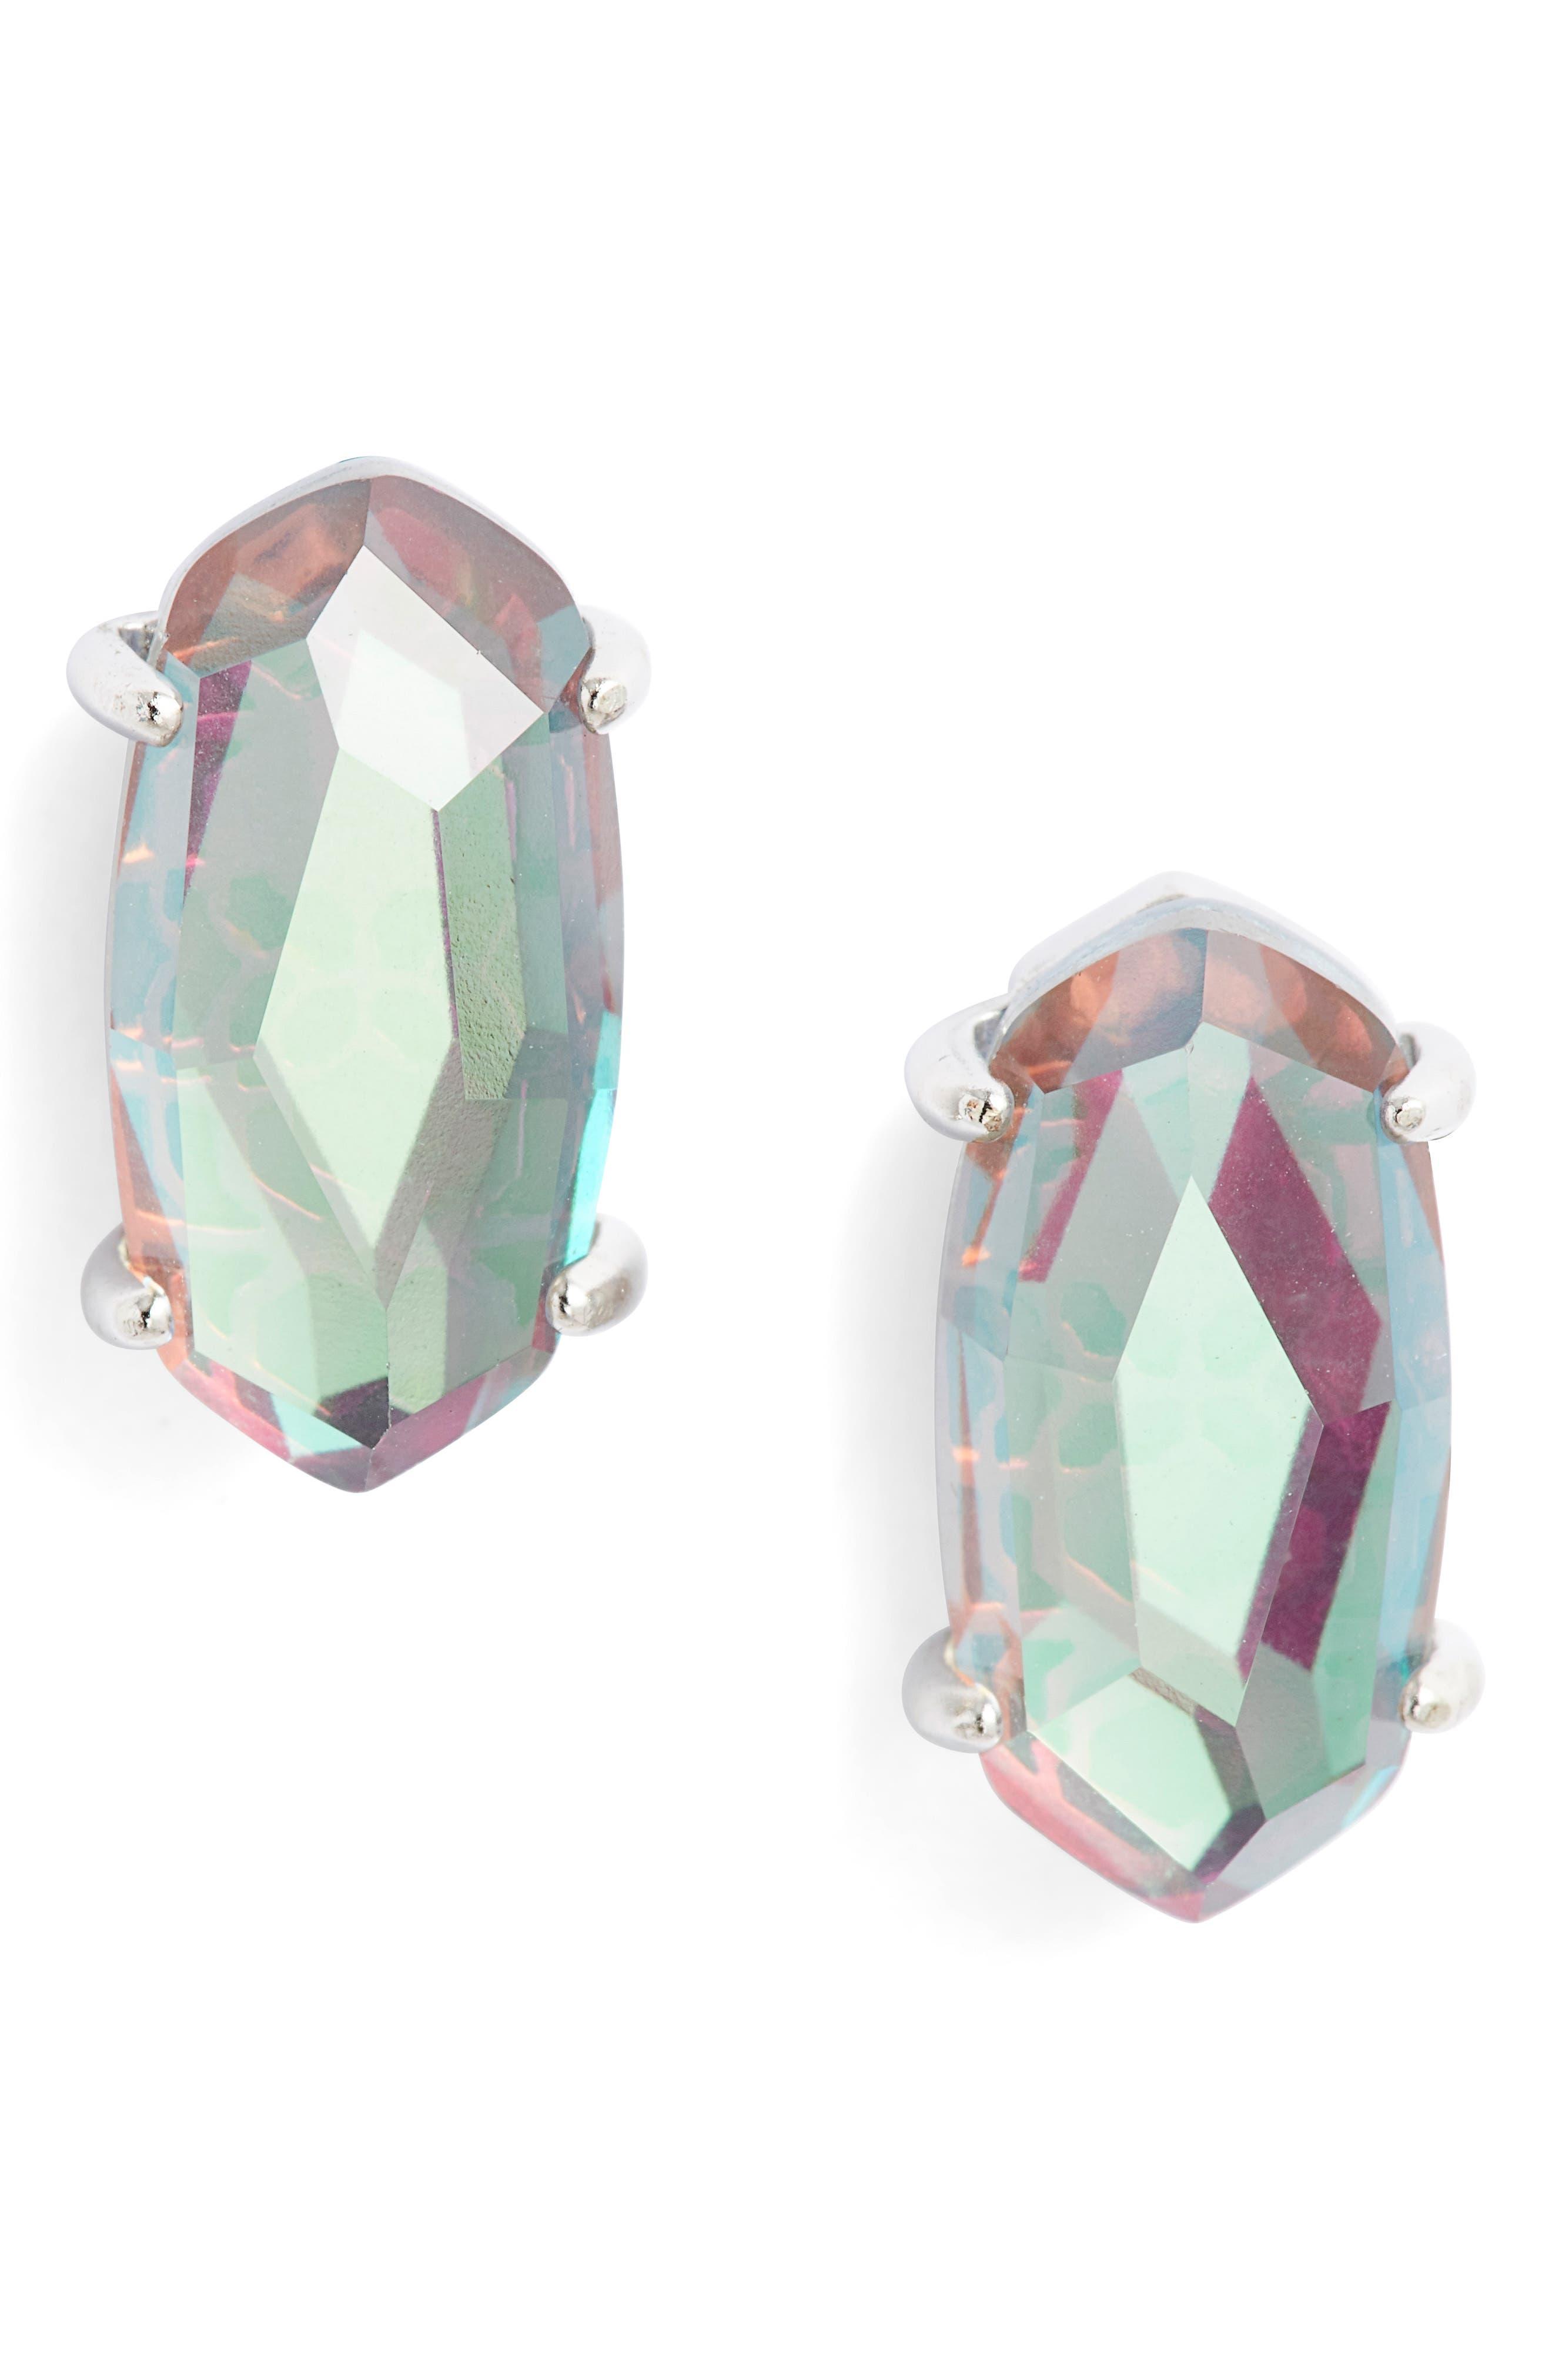 KENDRA SCOTT Betty Stud Earrings, Main, color, GRAY DICHROIC GLASS/ SILVER